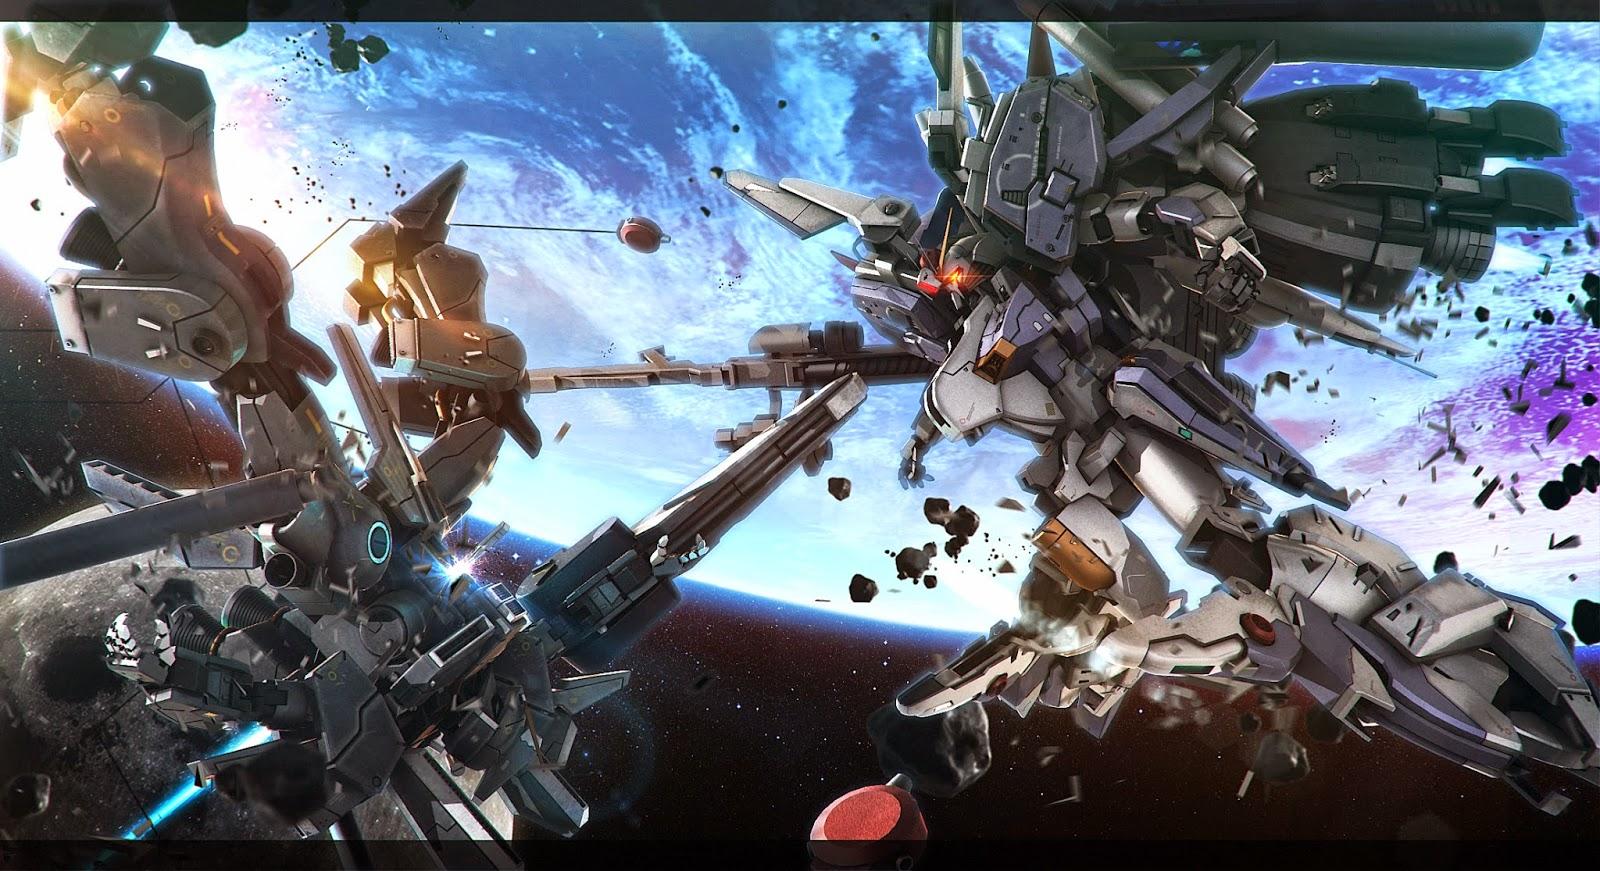 Gundam Ex S Vs Gundam Mk V Wallpaper By Hsiry Gundam Kits Collection News And Reviews